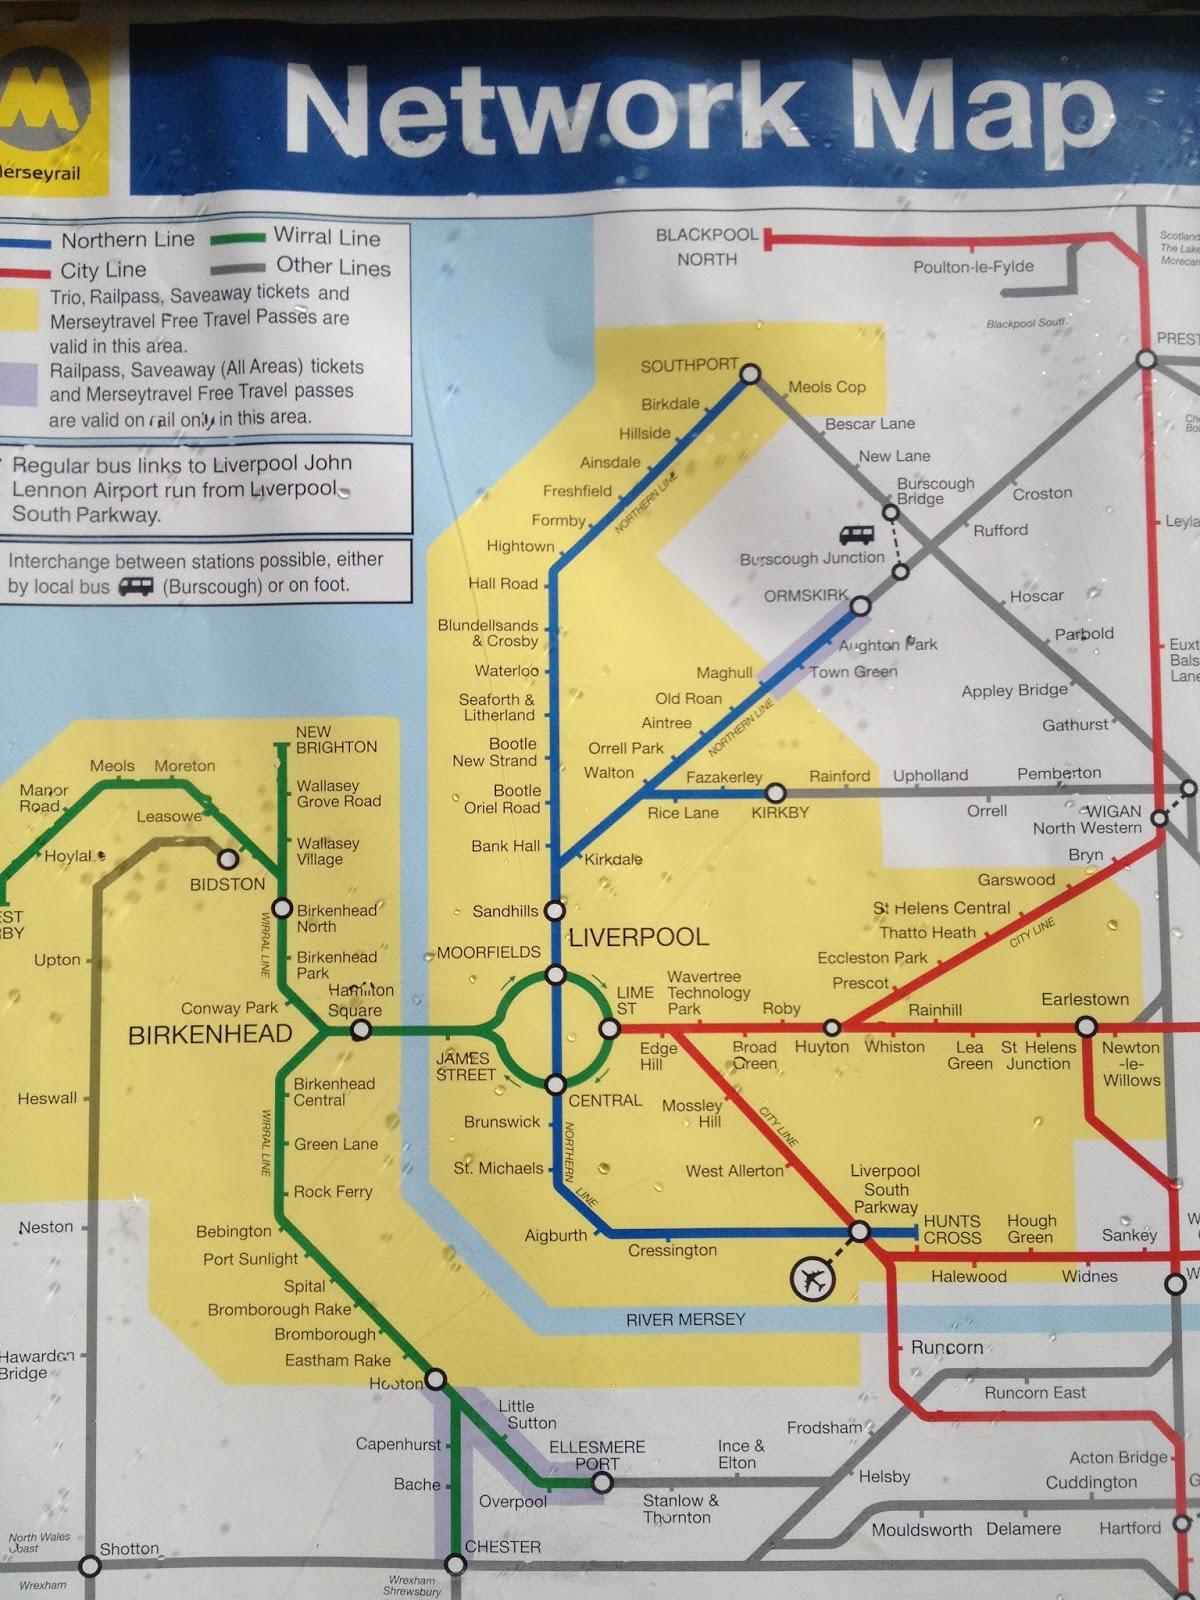 round the north we go Here We Go Loop De Loop